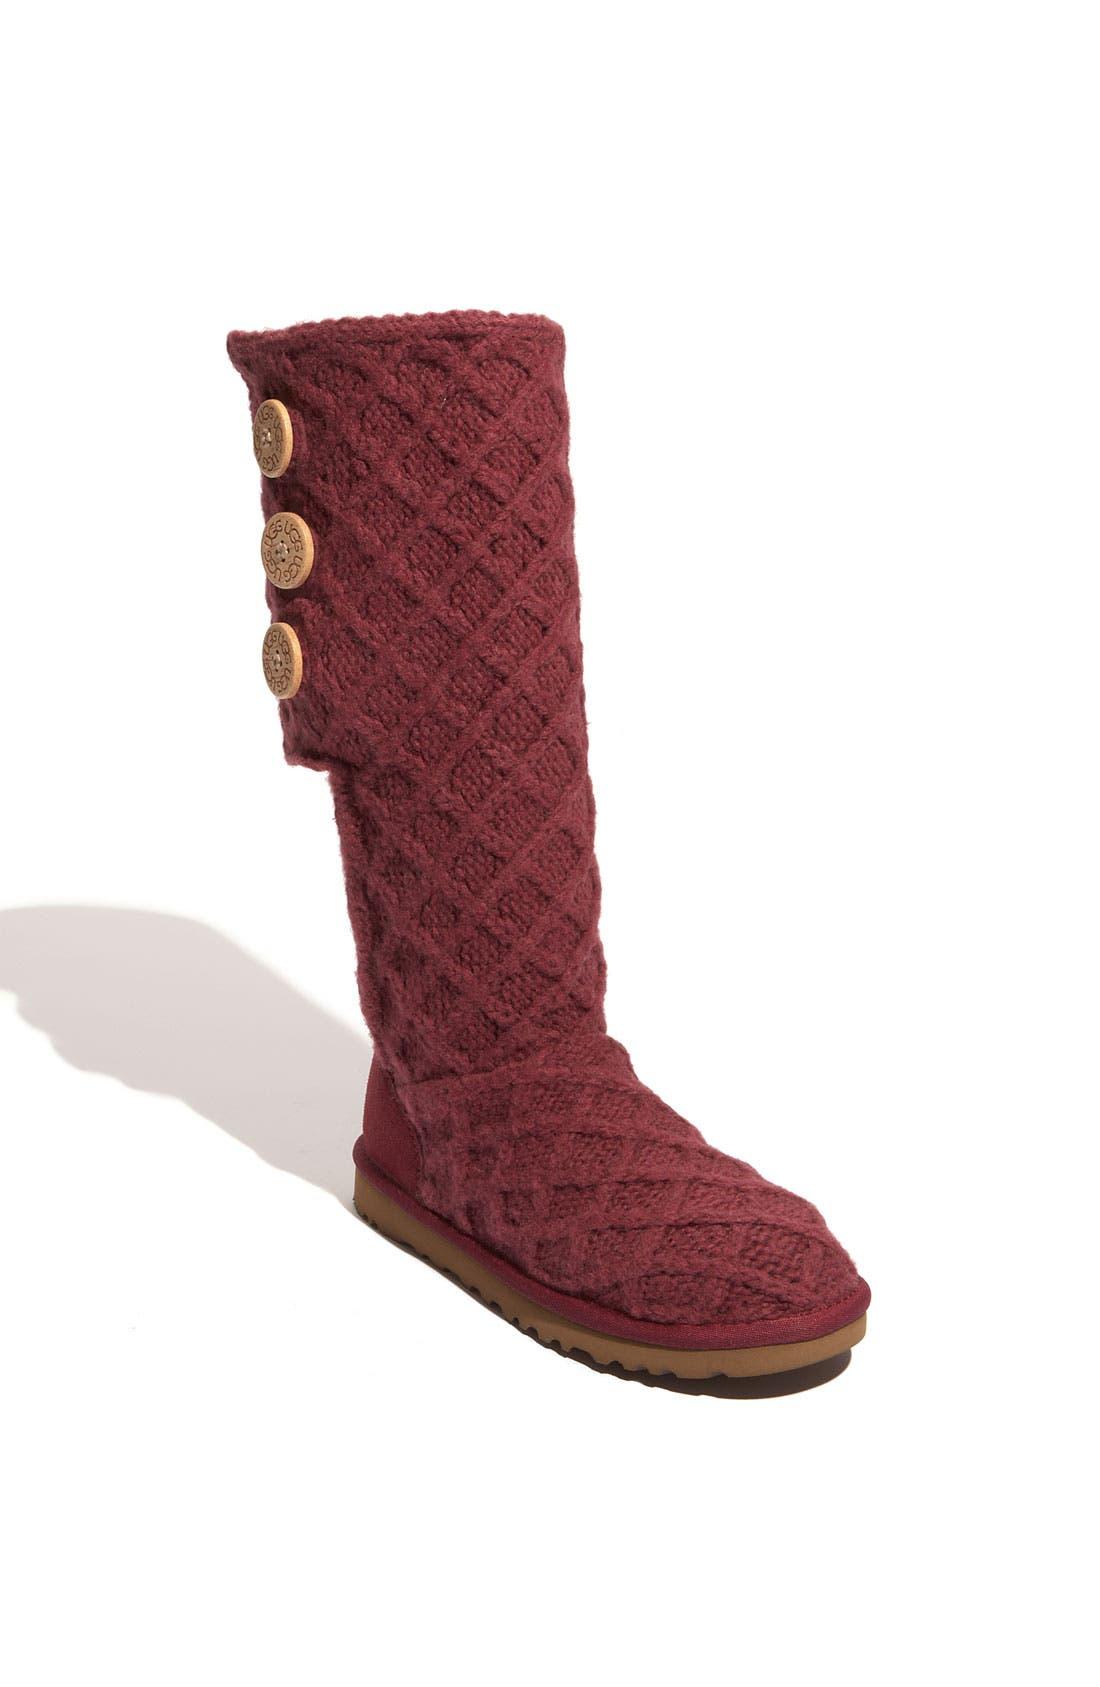 Main Image - UGG® Australia 'Lattice Cardy' Boot (Women)